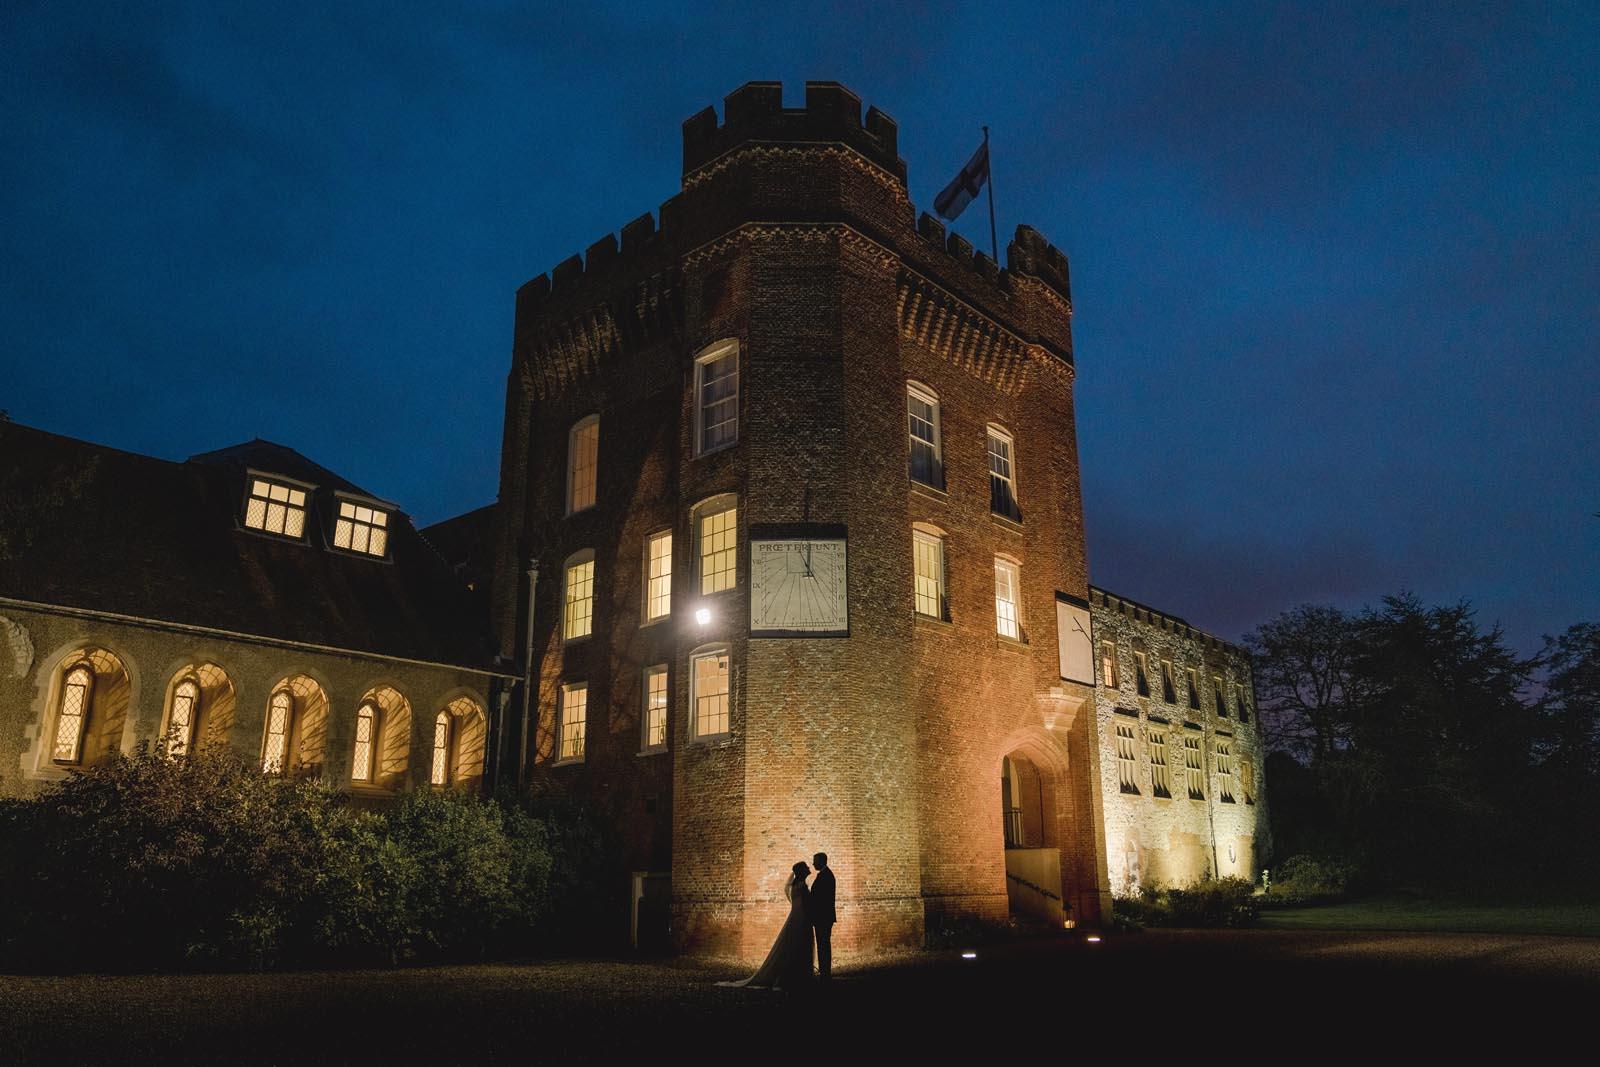 Farnham Castle lit up at night